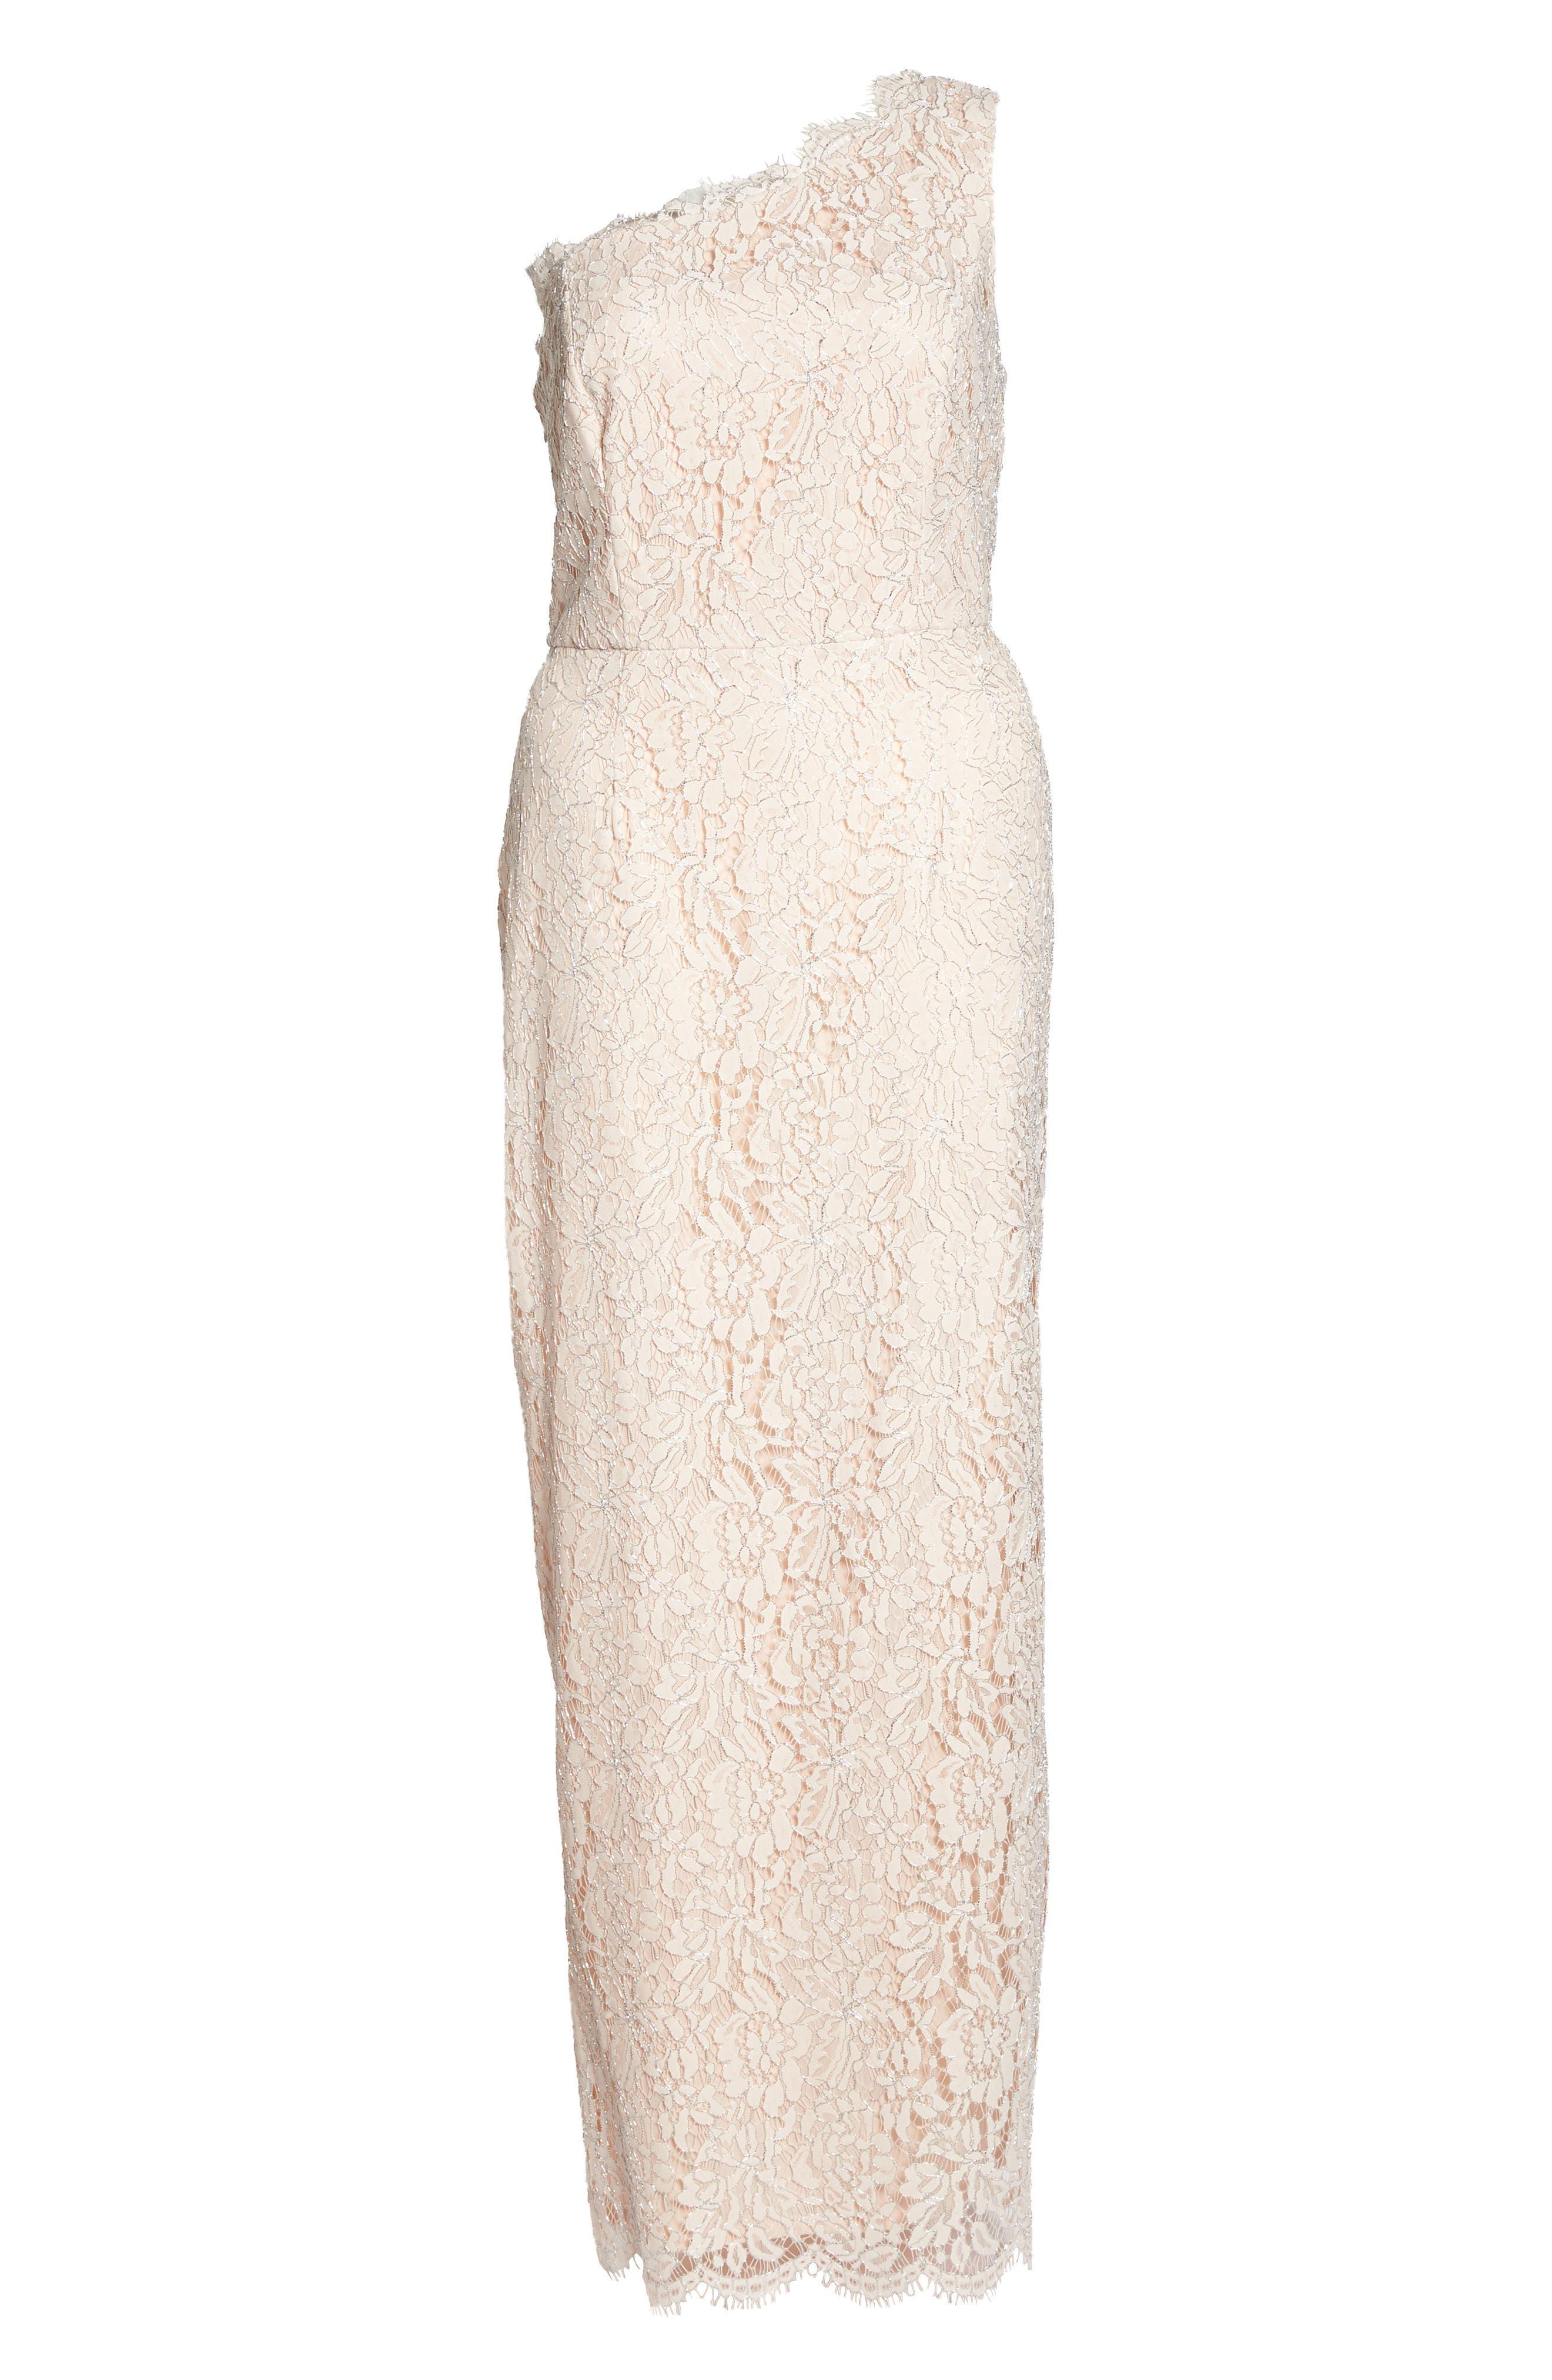 One-Shoulder Metallic Lace Gown,                             Alternate thumbnail 6, color,                             Blush